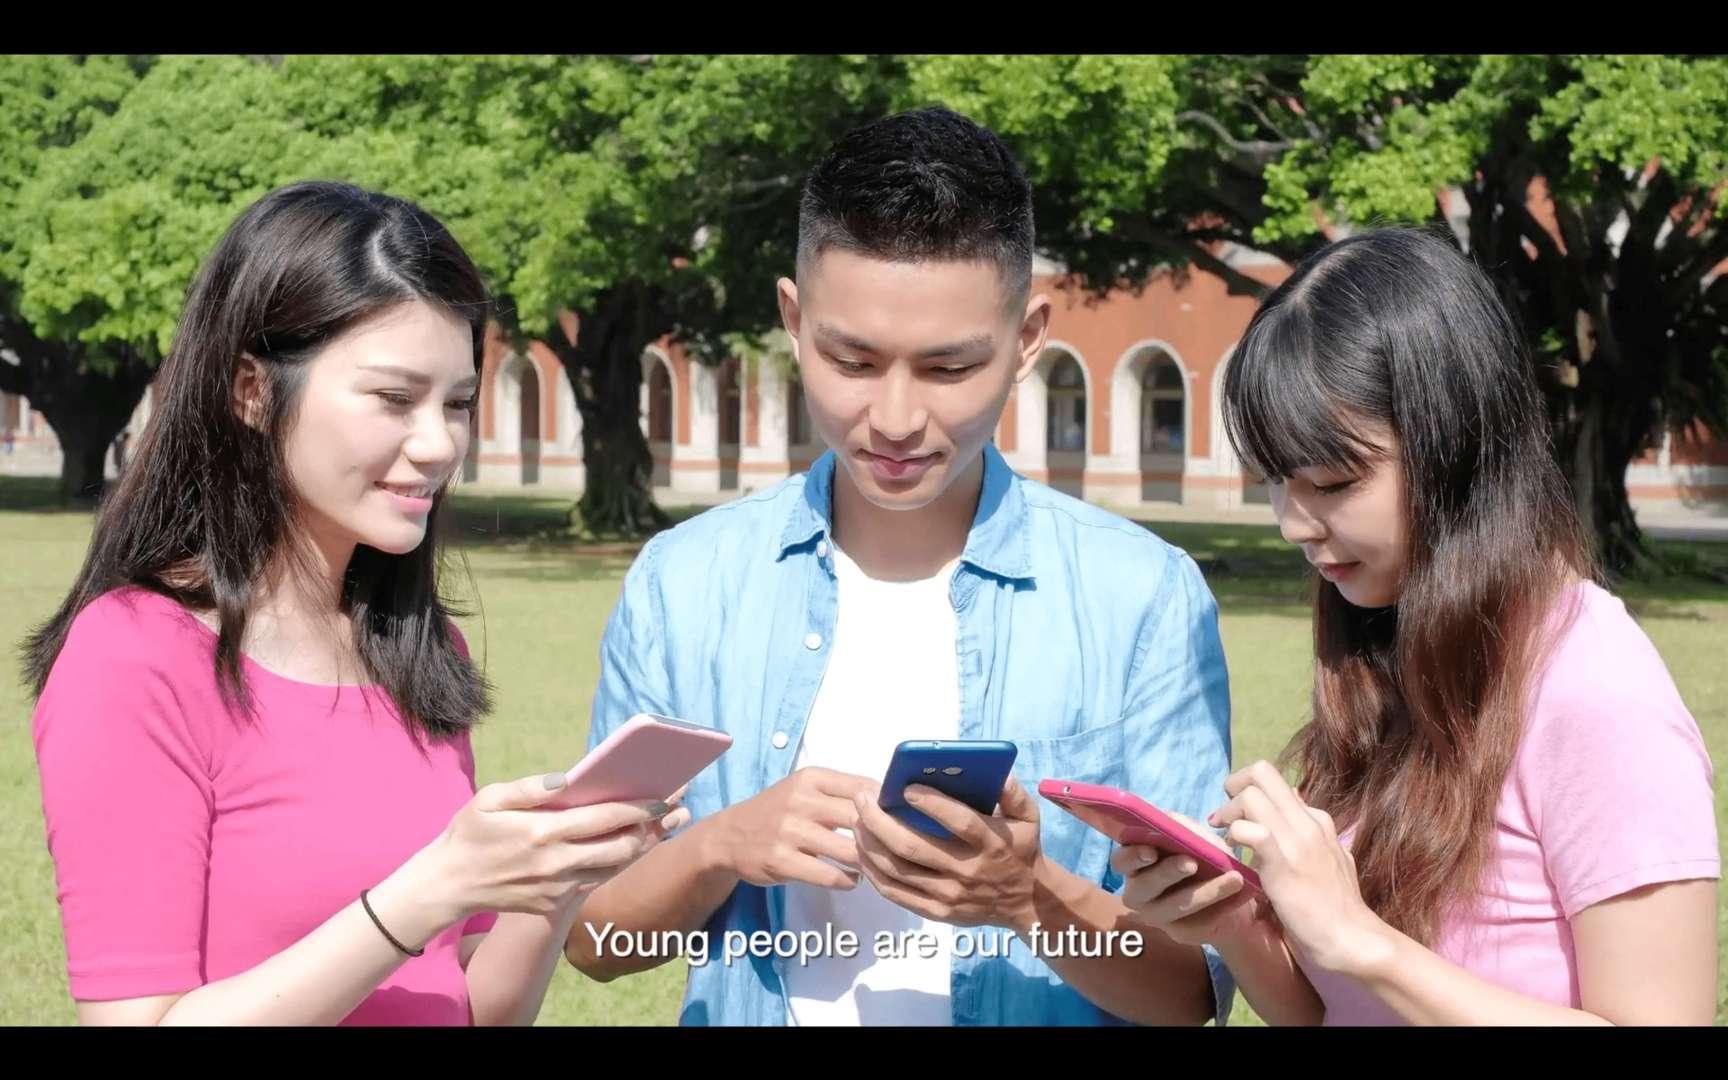 HSBC Future Skills Development Project Introduction Video